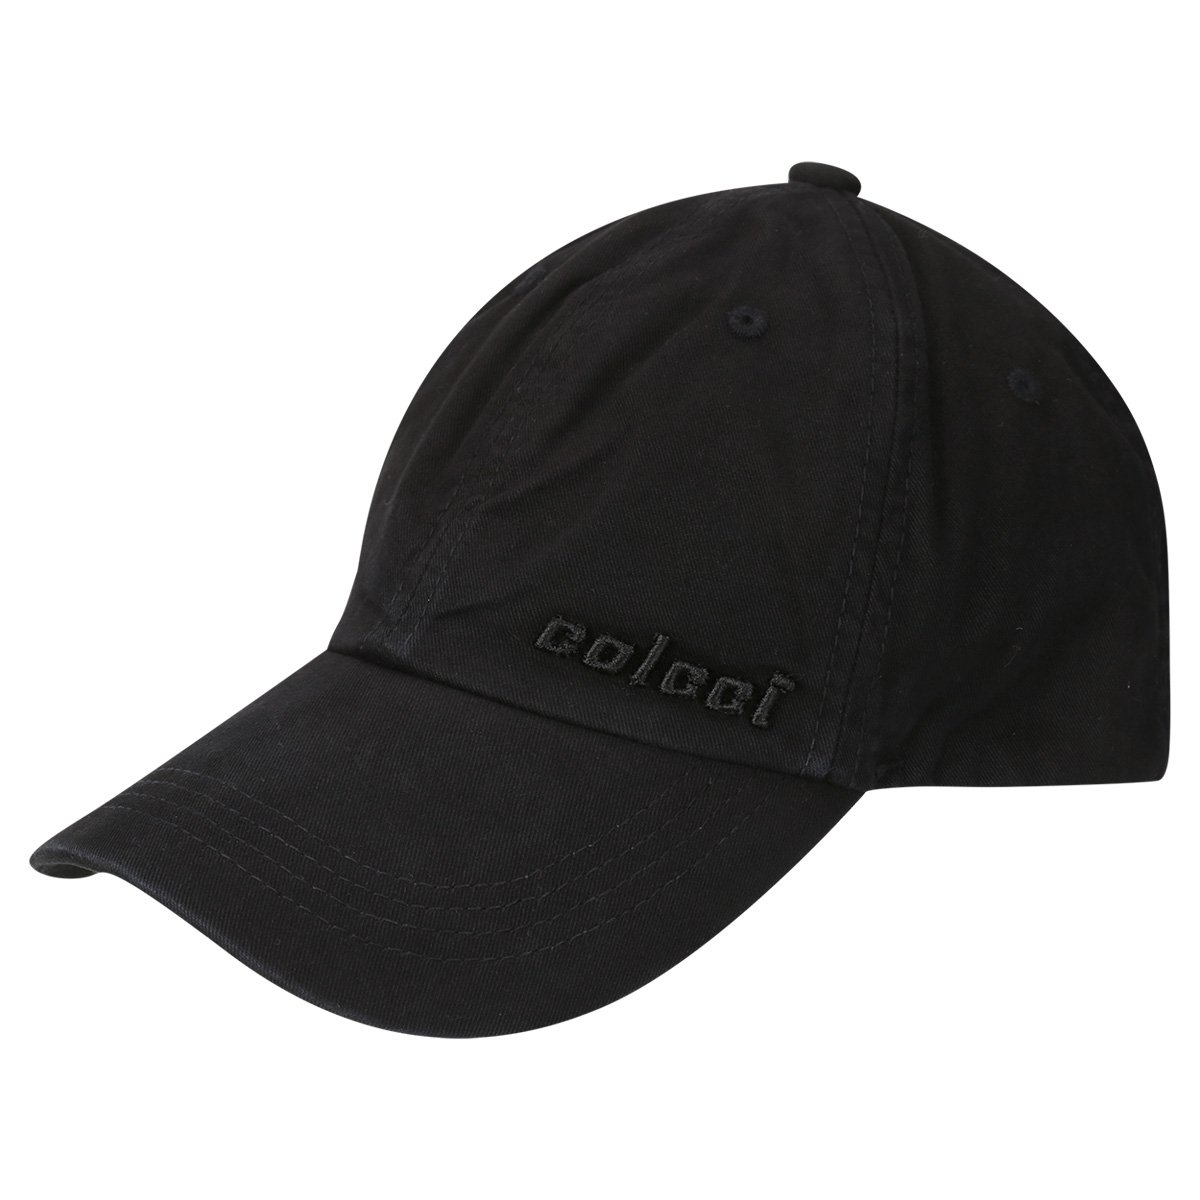 Boné Colcci Aba Curva Básico Bordado - Compre Agora  7f3d84d912e